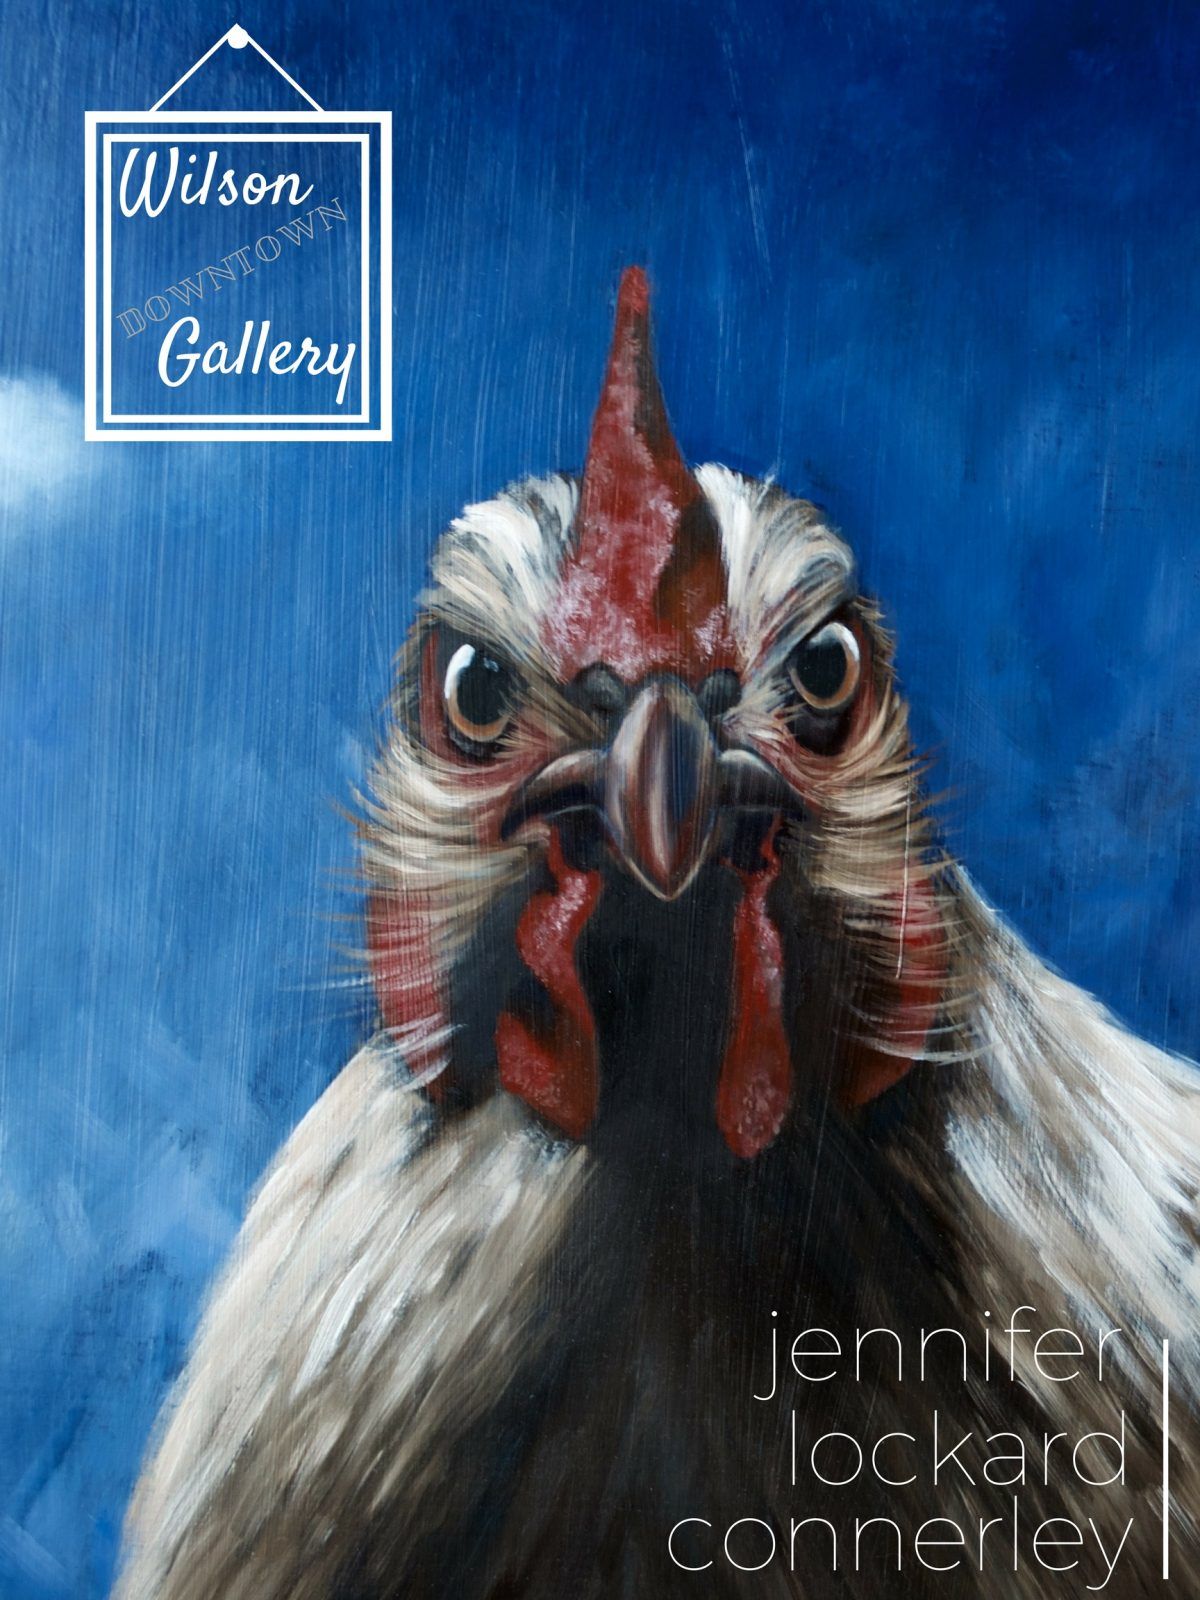 Wilson Downtown Gallery: Jennifer Lockard Connerley